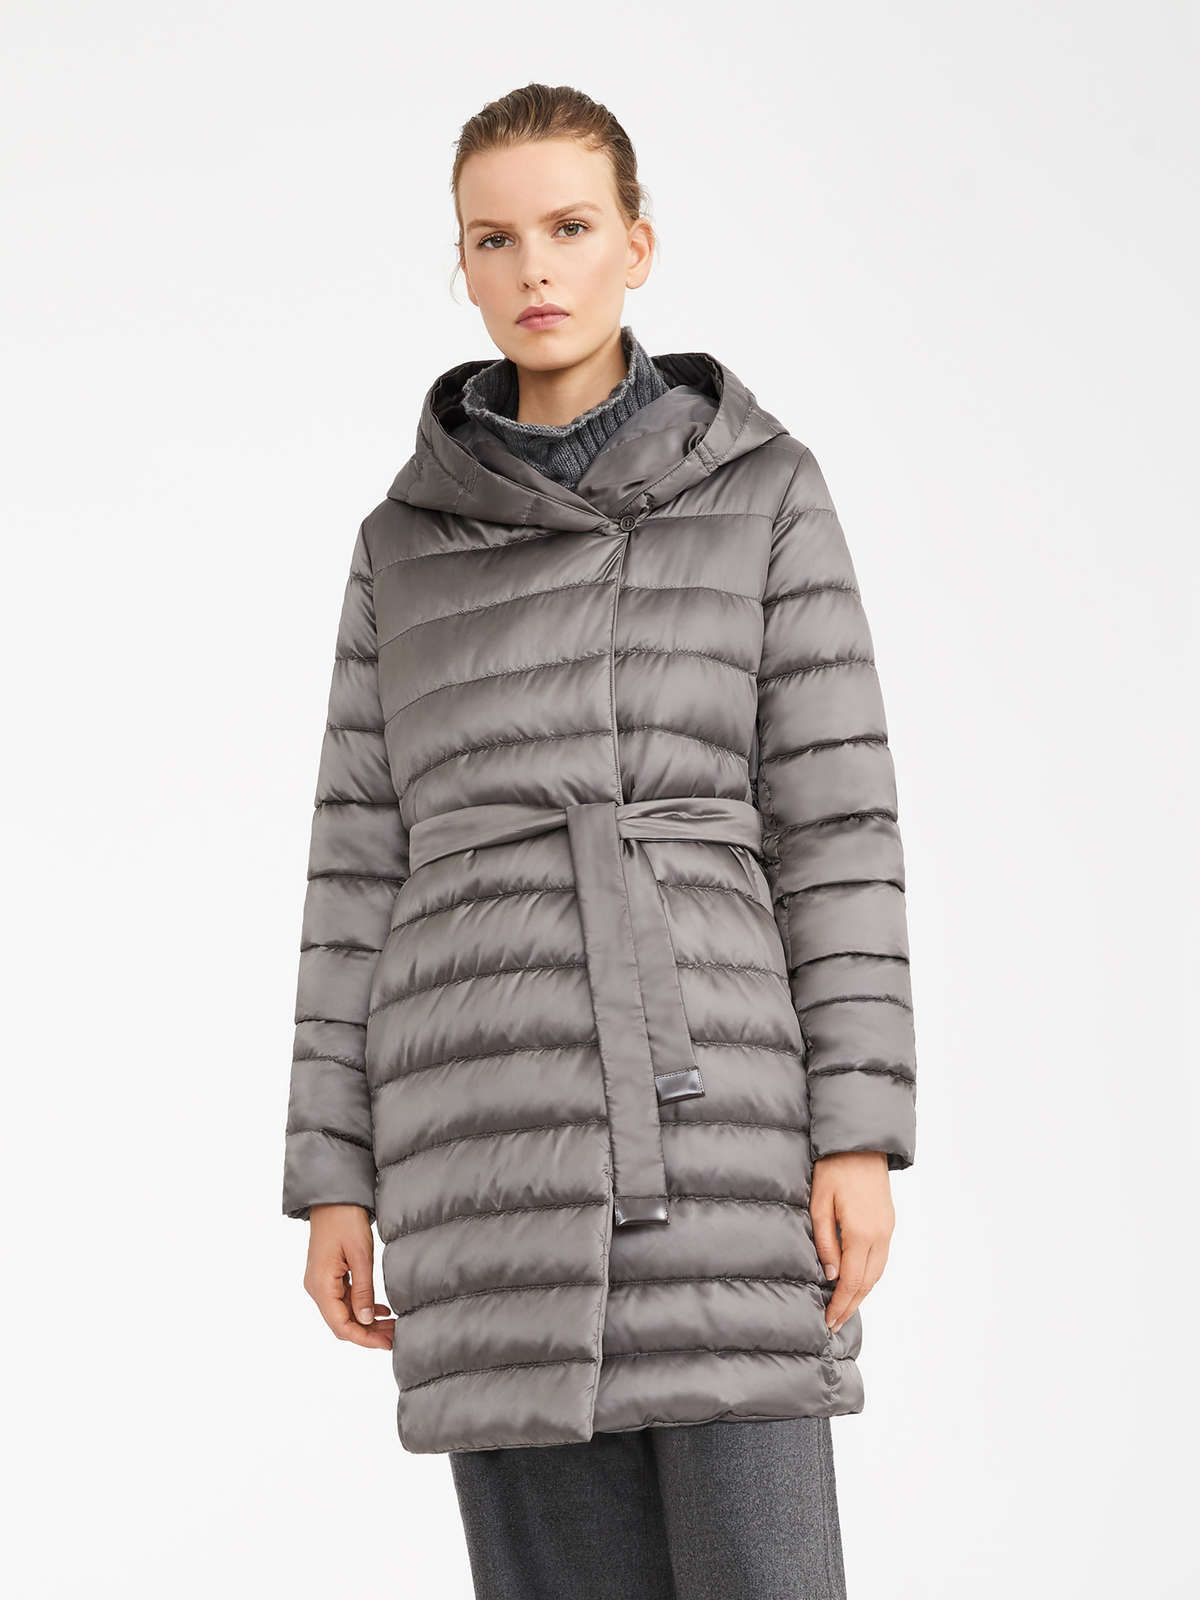 Women S Padded Coats New 2019 Collection Max Mara Jackets Coat 2020 Puffer Jackets [ 1600 x 1200 Pixel ]